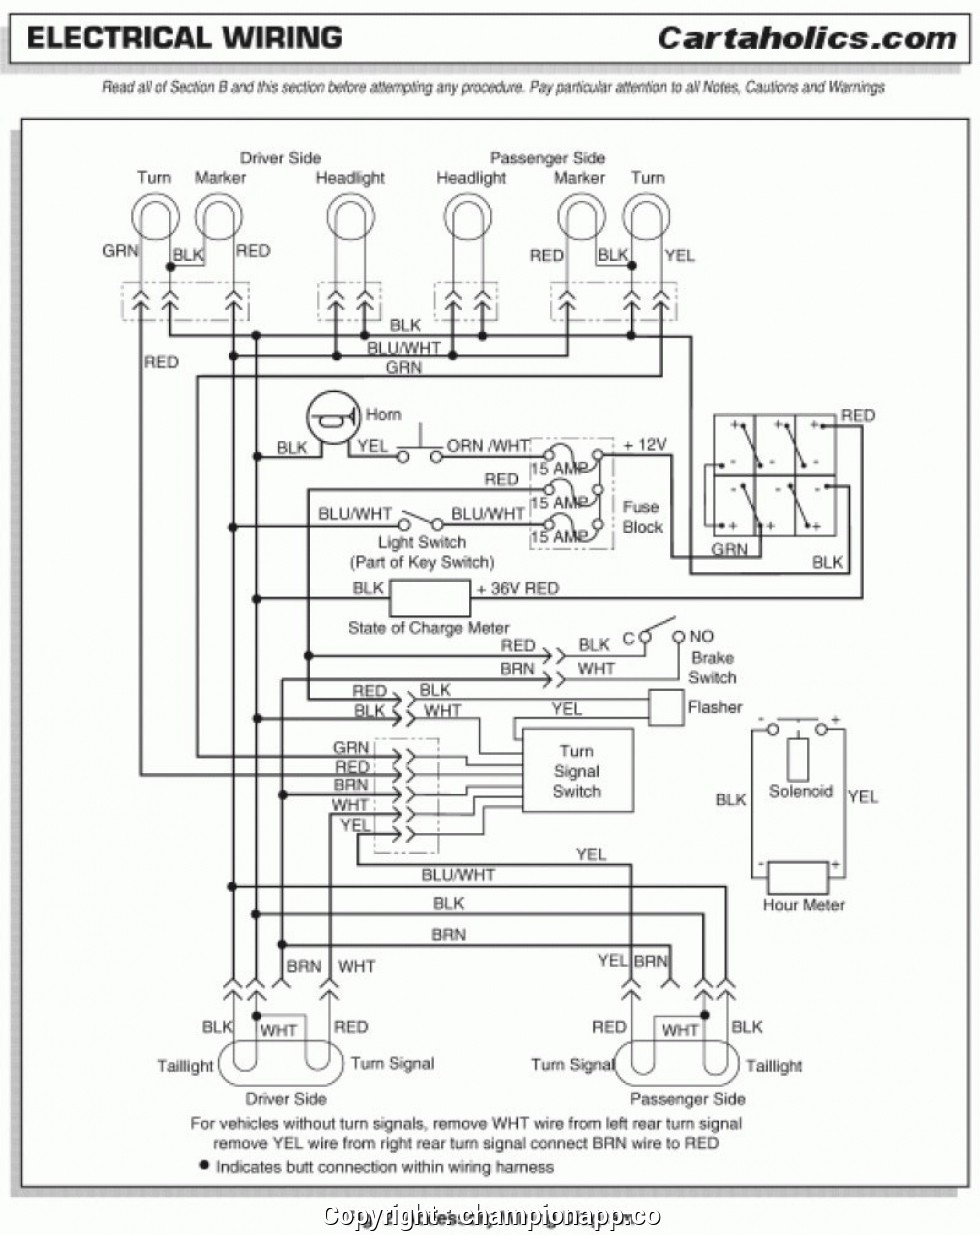 Ezgo Light Wiring Diagram | Wiring Diagram - Ez Go Golf Cart Battery Wiring Diagram